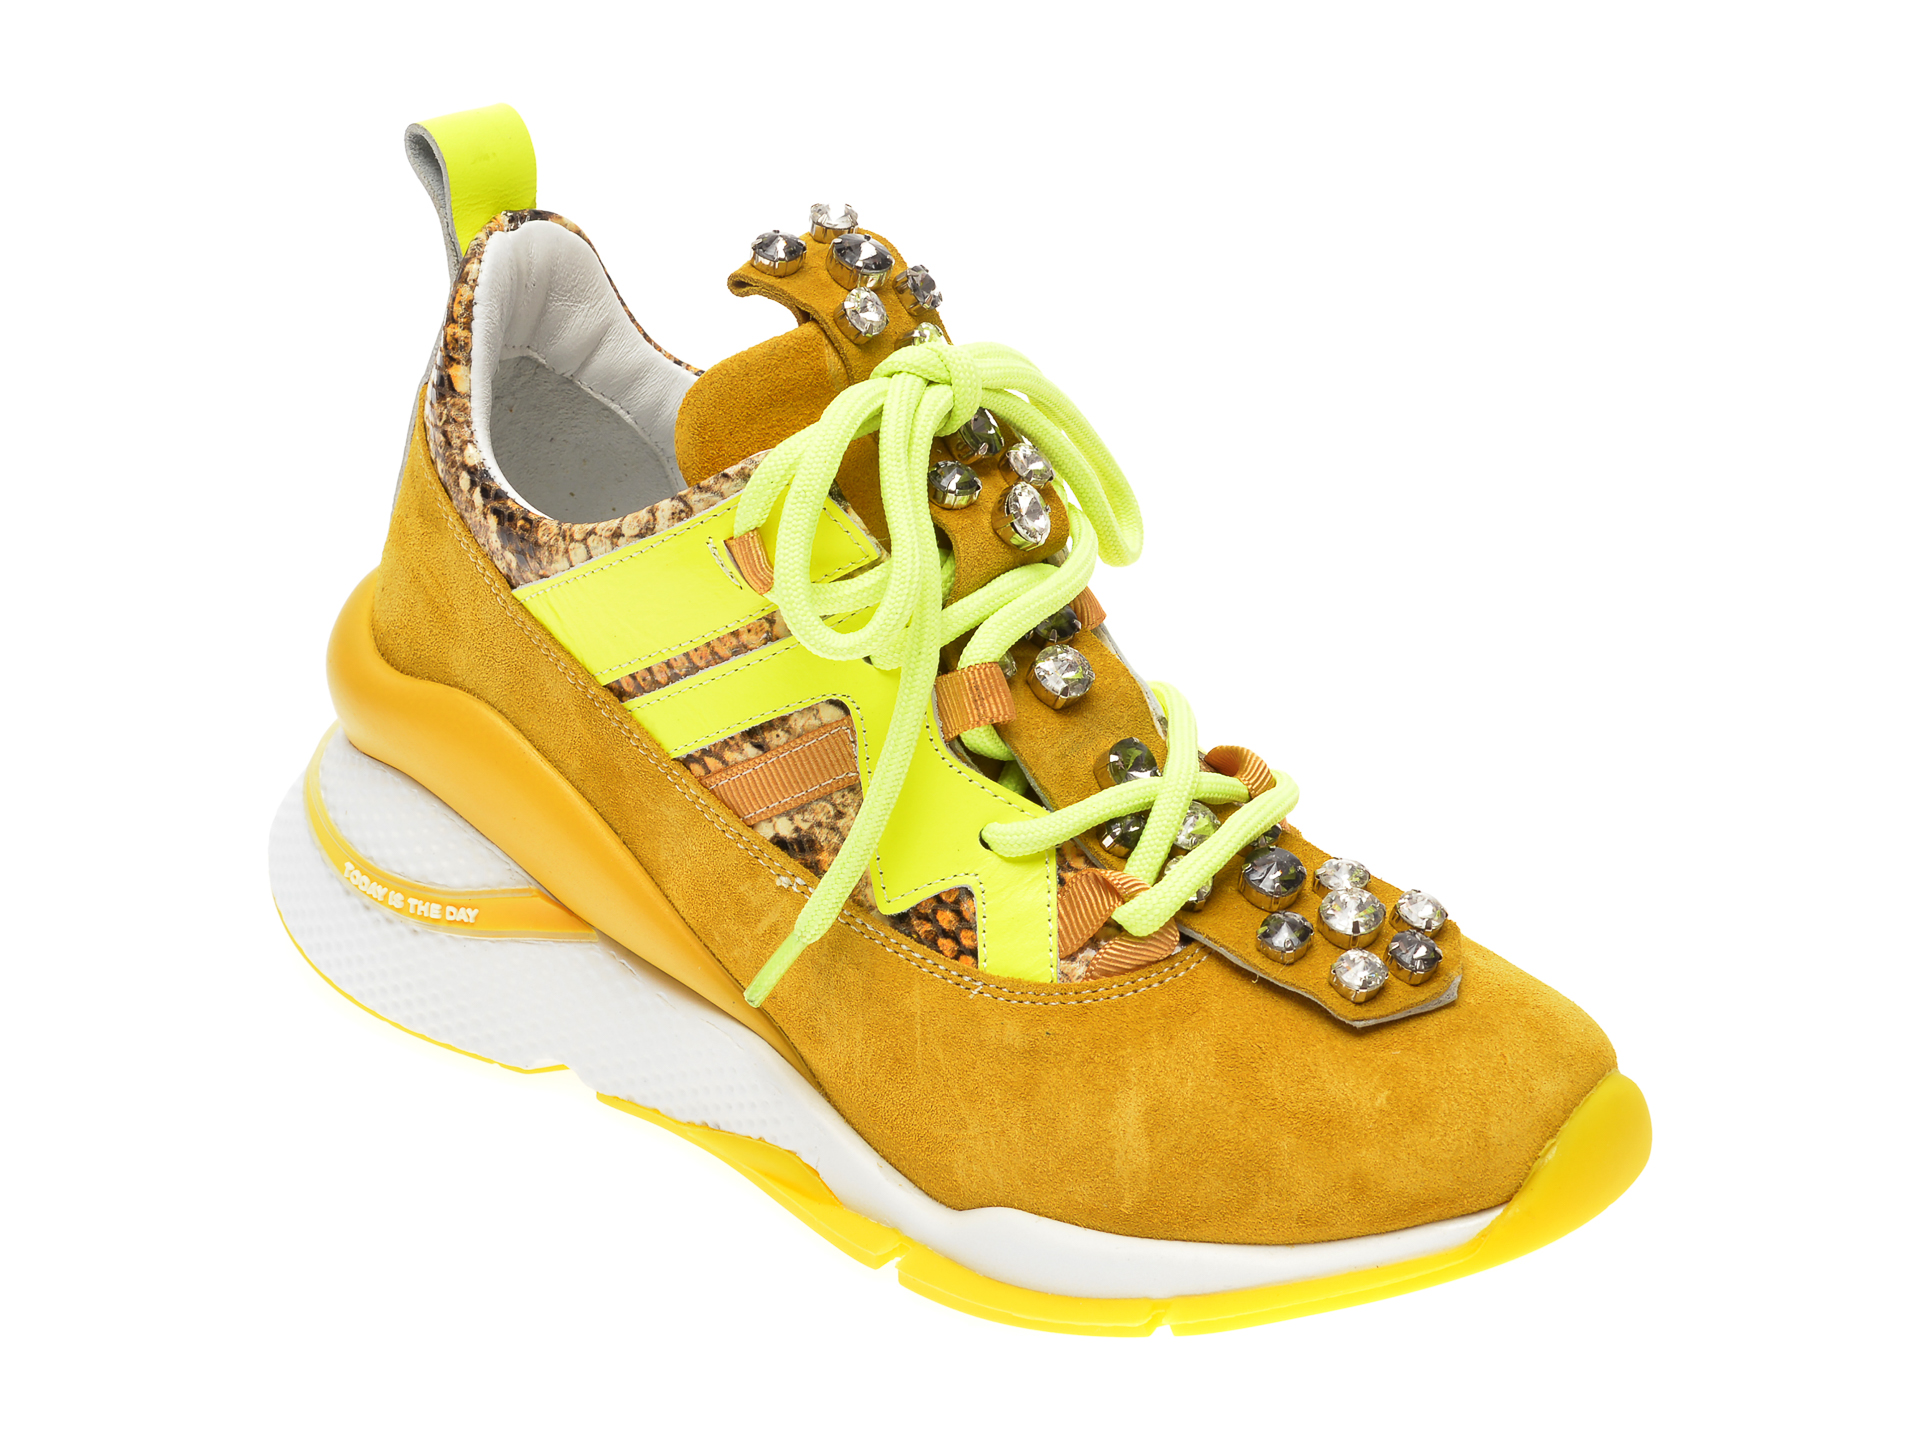 Pantofi sport EPICA galbeni, 3133GE, din piele intoarsa